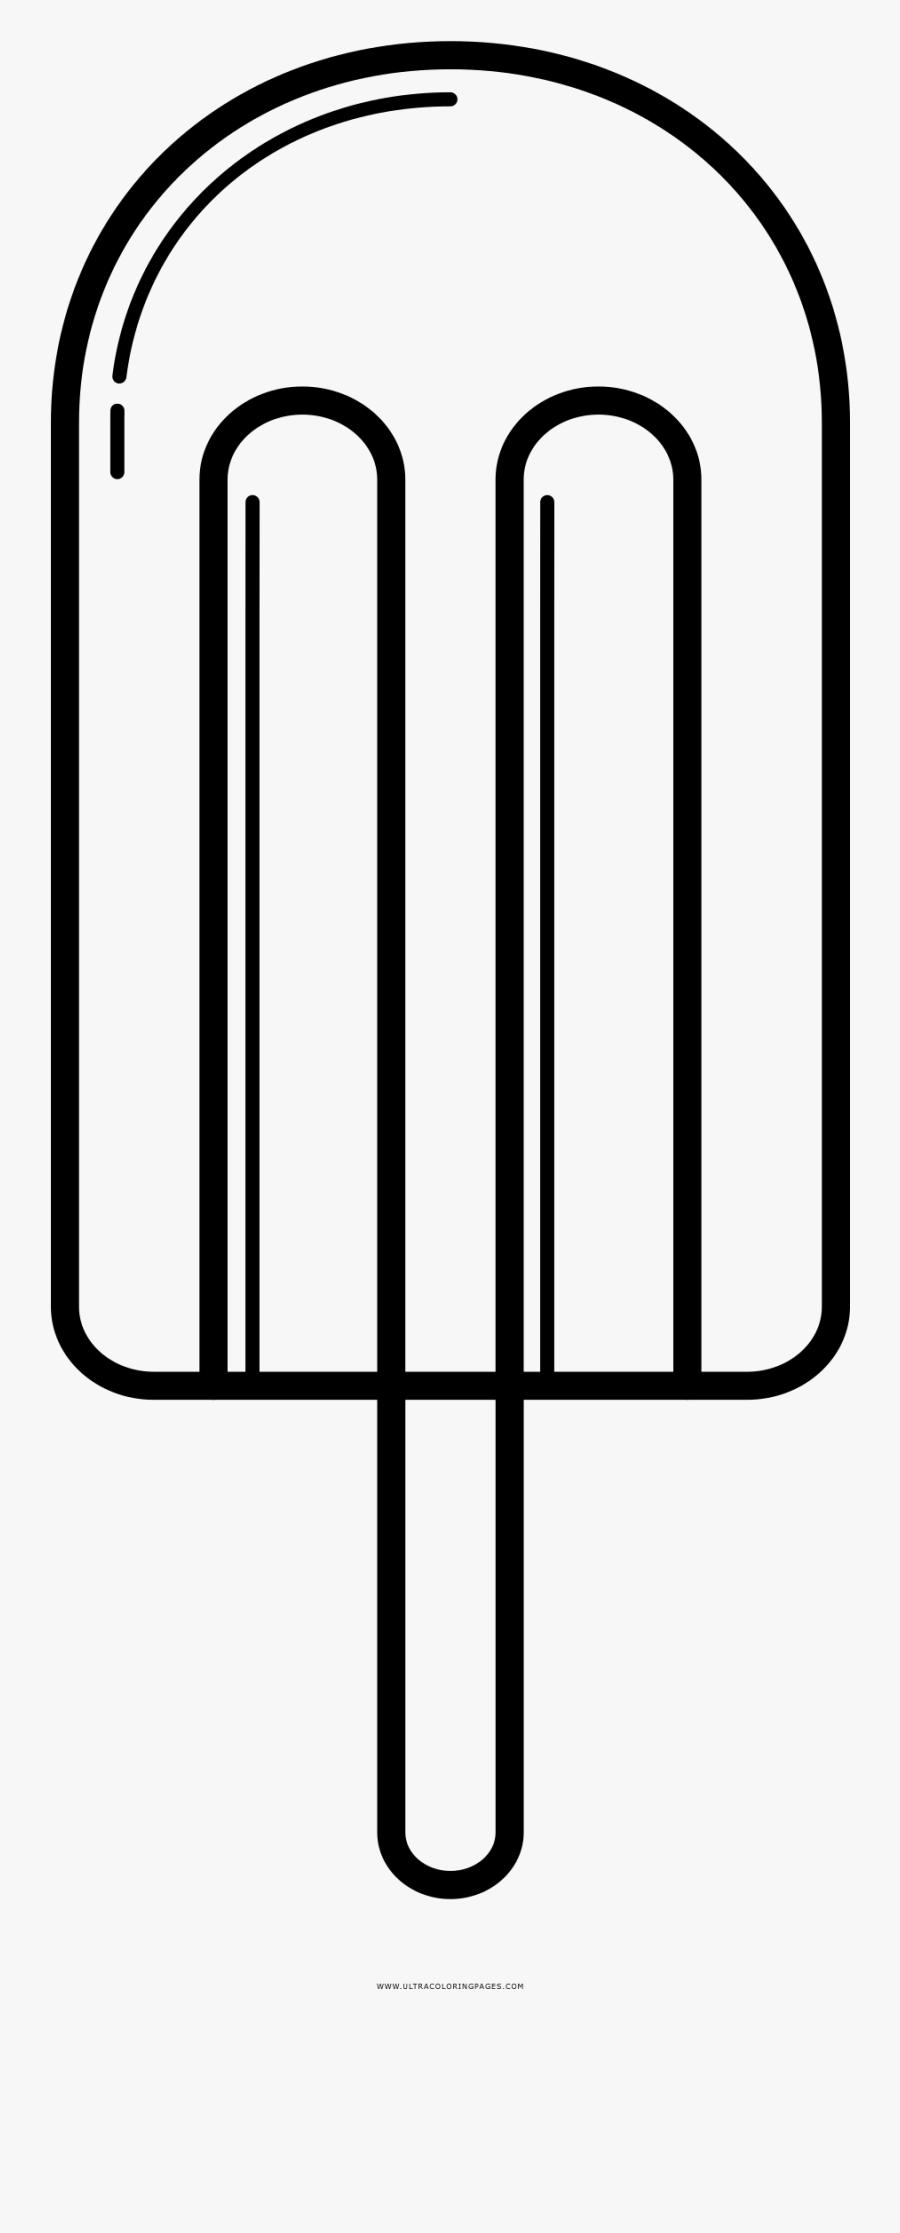 Popsicle Coloring Page Coloring Page Popsicle Free Transparent Clipart Clipartkey